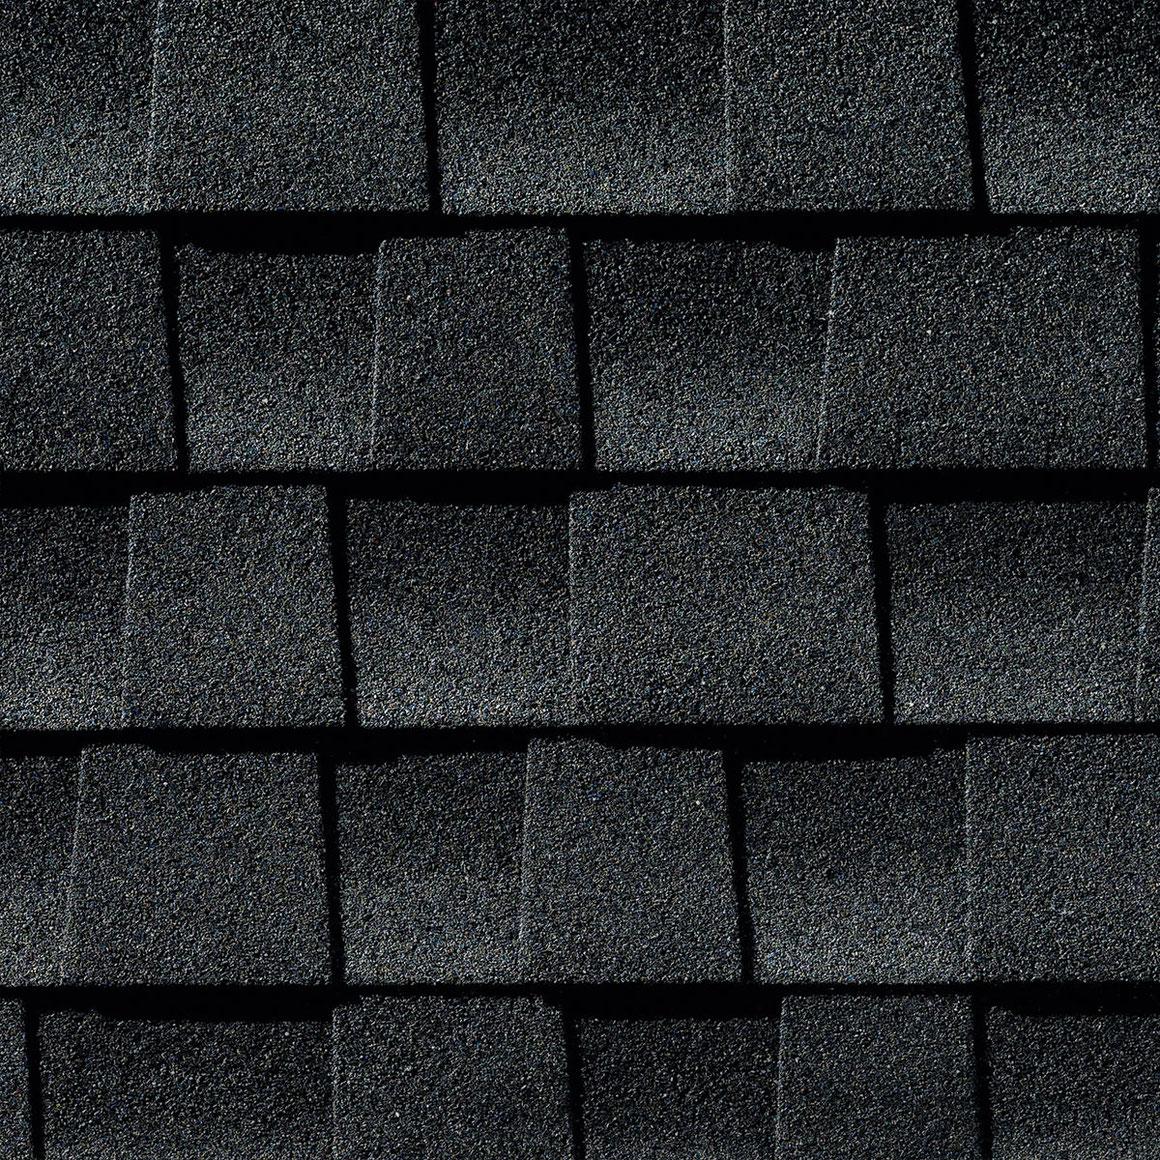 Gont bitumiczny laminowany GAF Timberline HD, kolor Charcoal